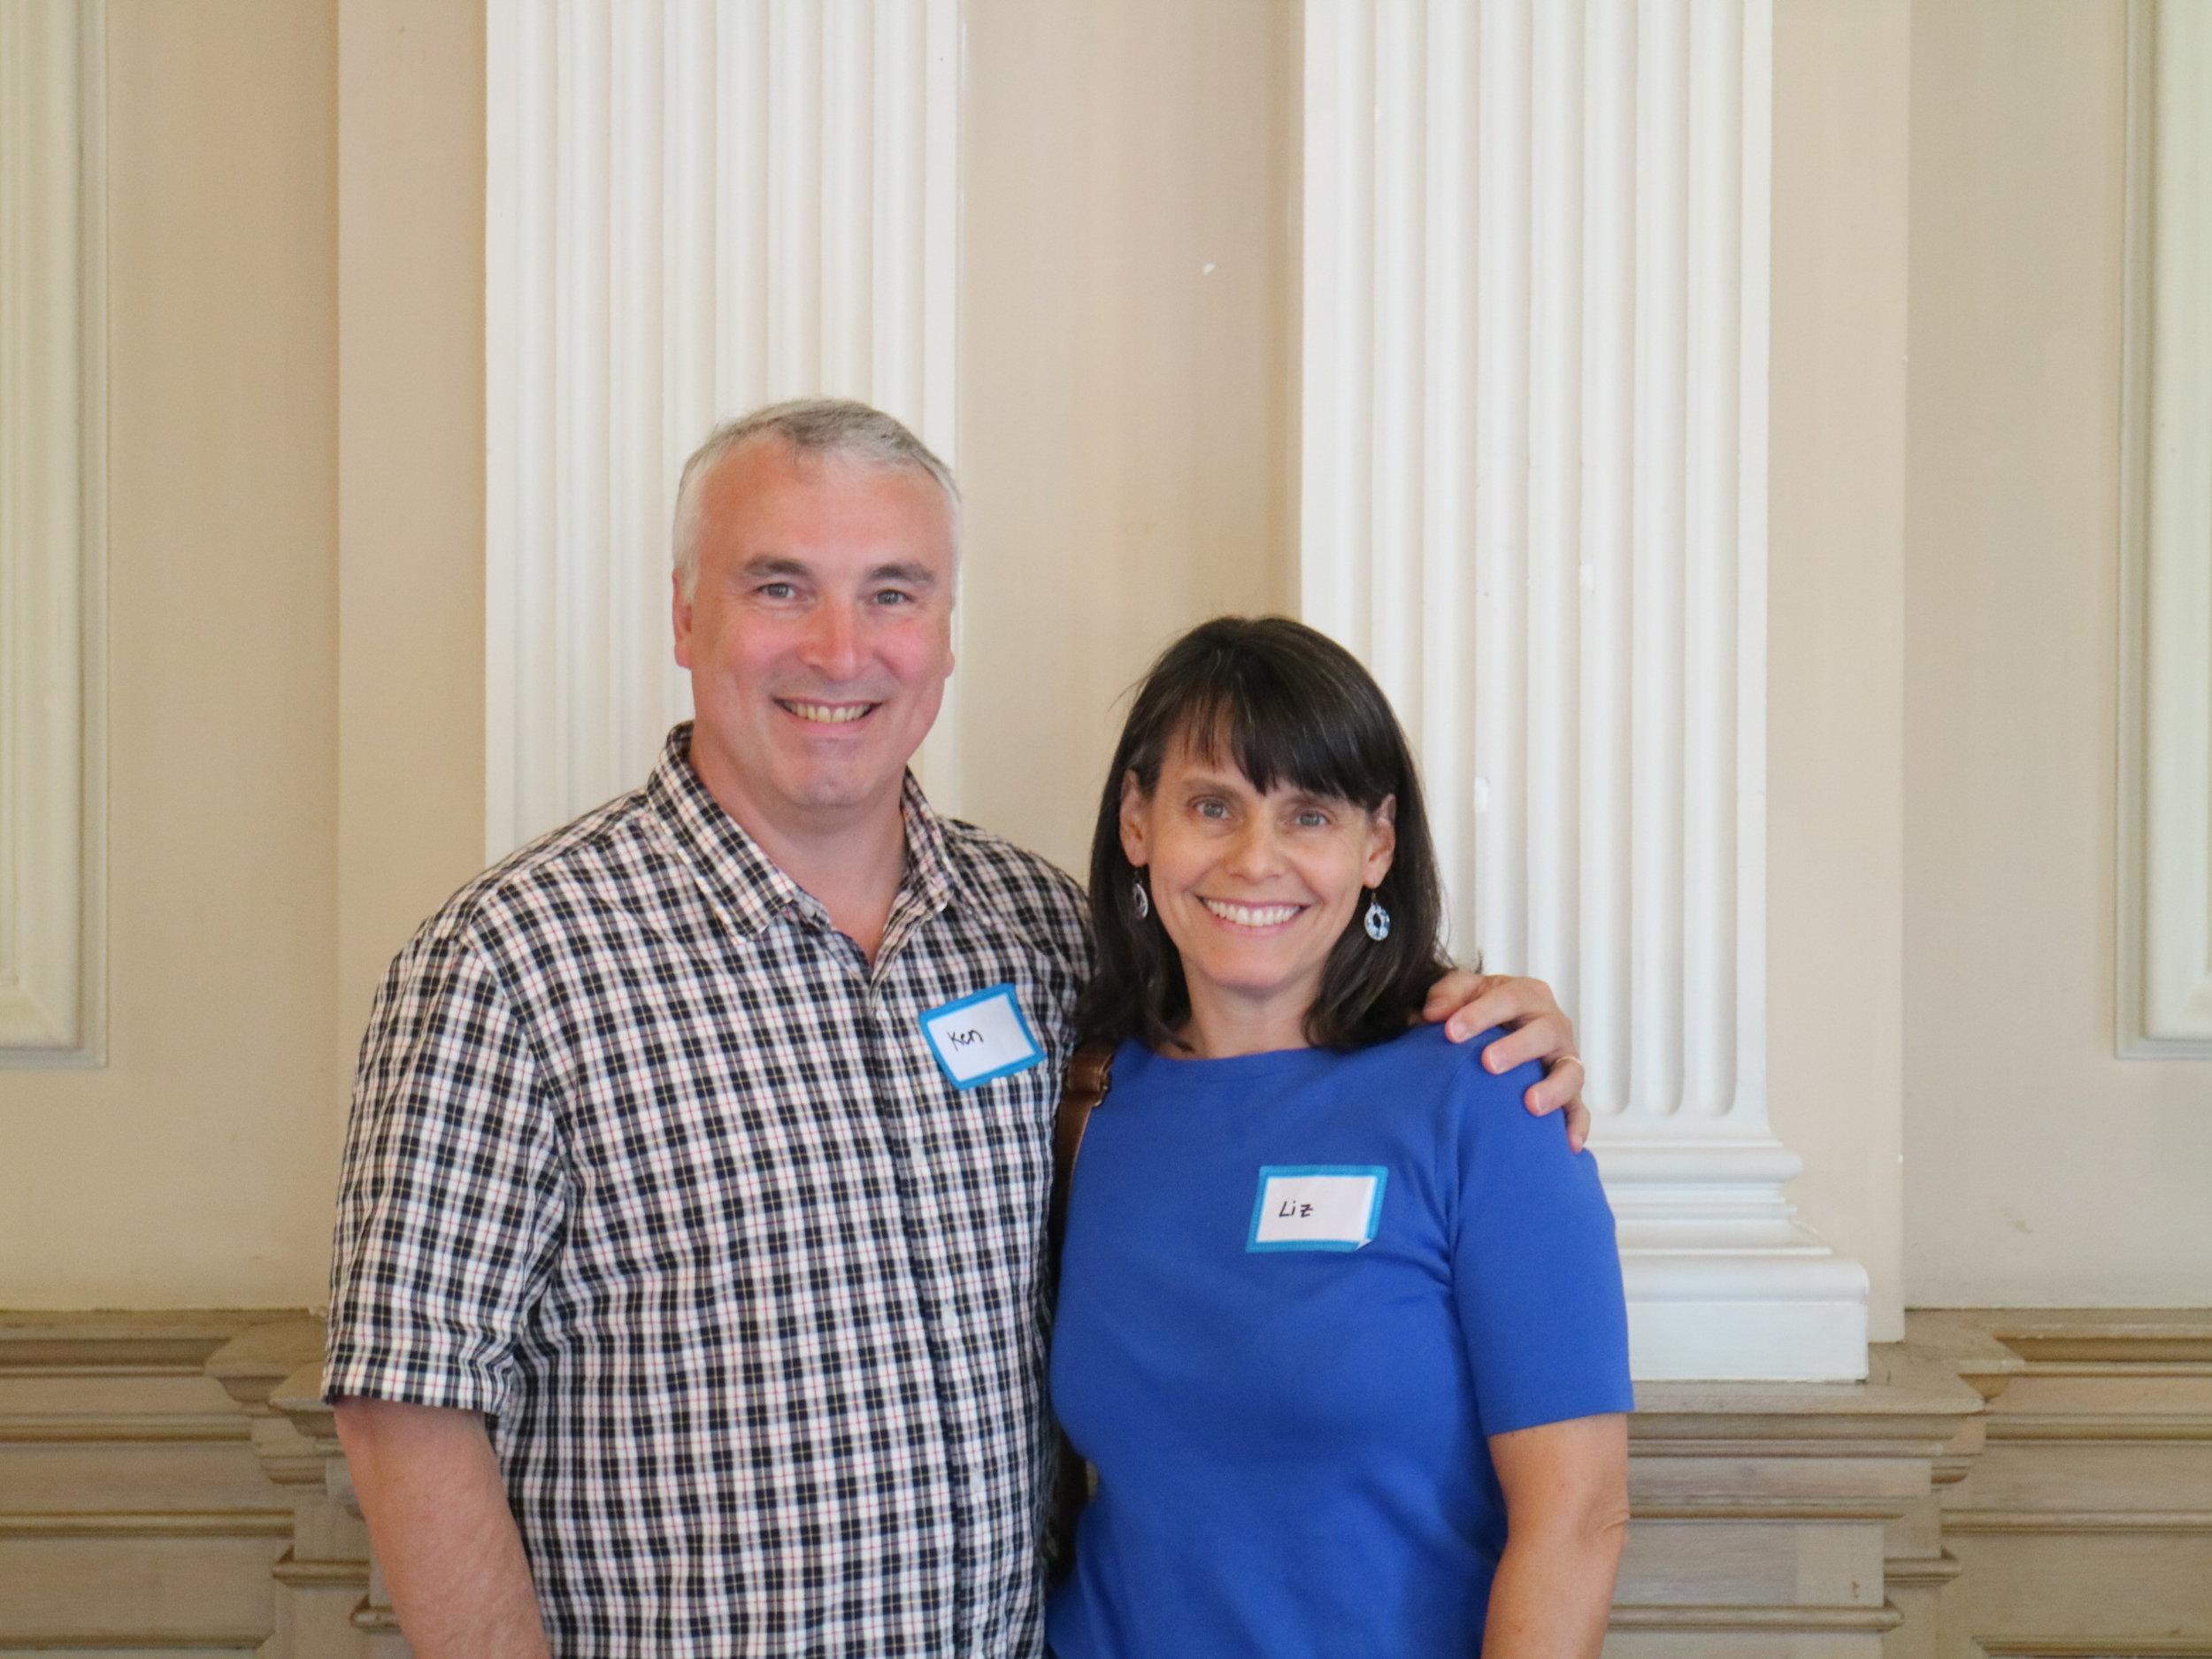 Ken Scalet and Liz Sadove